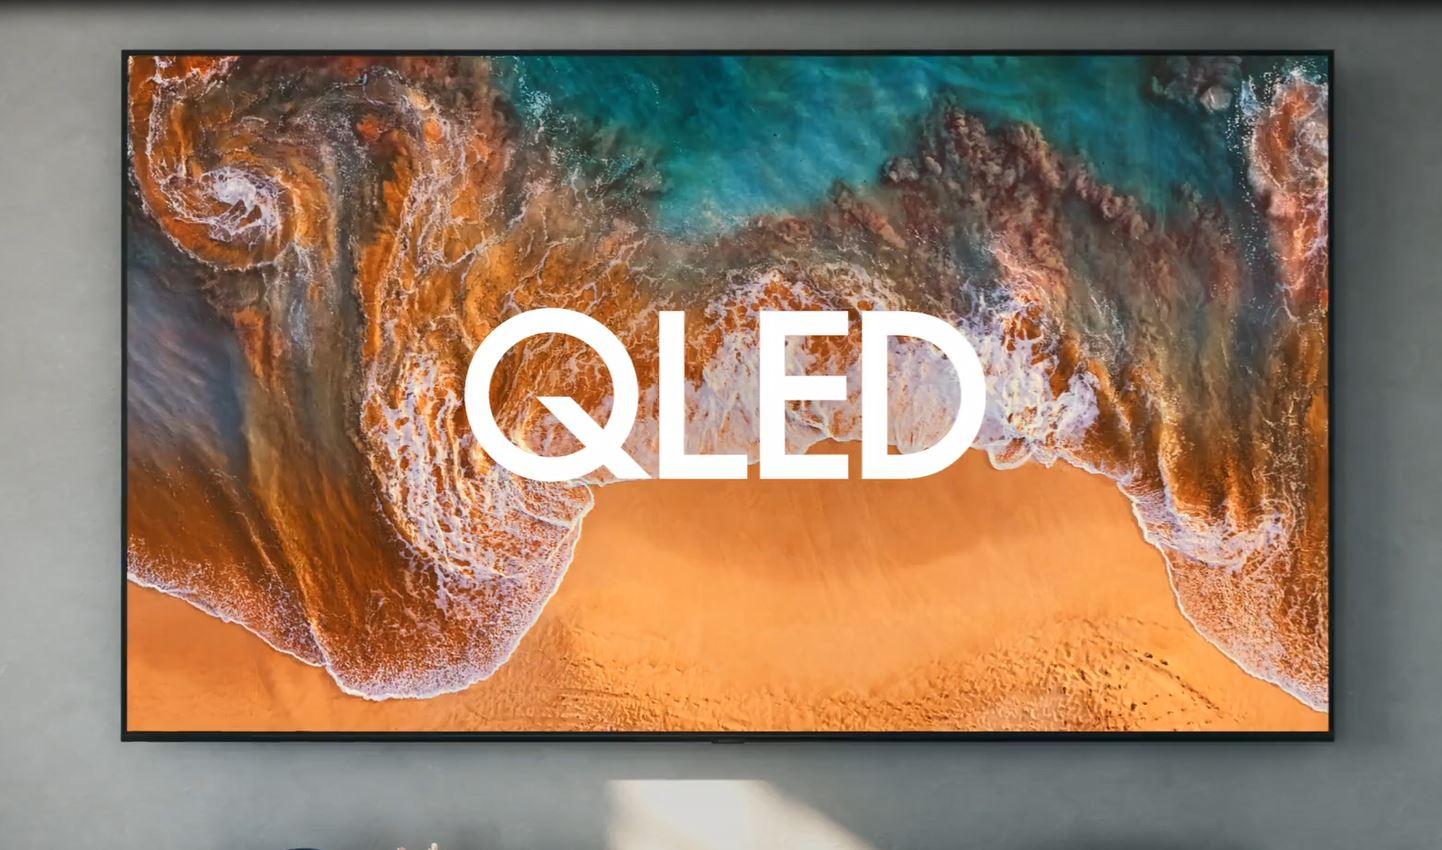 SAMSUNG 65-inch class QLED smart TV